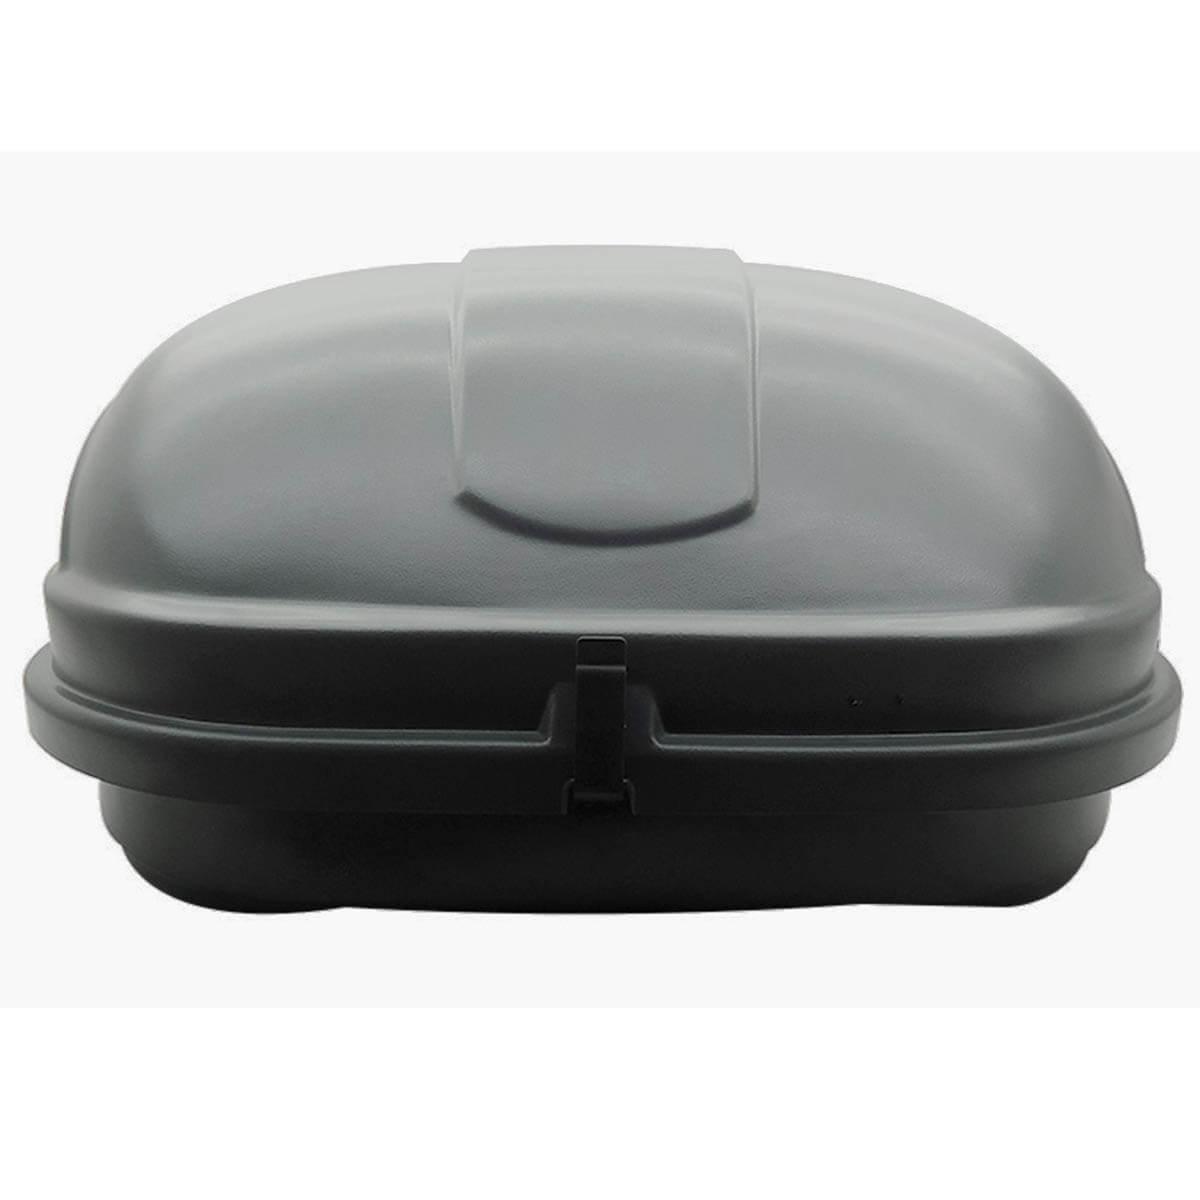 Bagageiro de teto maleiro com chave Motobul 600 litros cinza